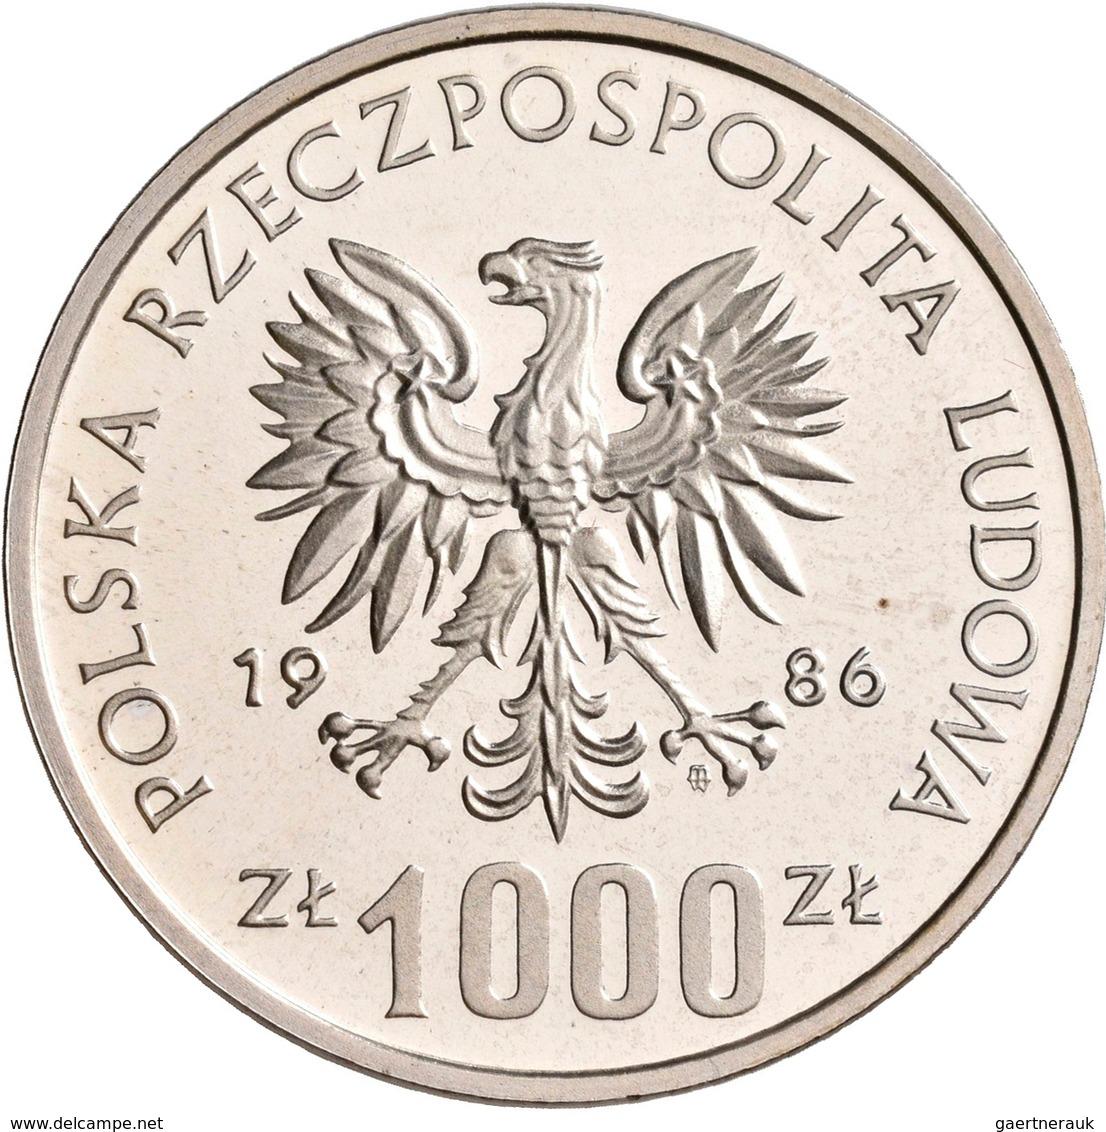 Polen: 1000 Zlotych 1986 PROBA: Wladyslaw I. Lokietek. 1320-1333, KM# PR 546, Fischer P 327. Lose, L - Pologne